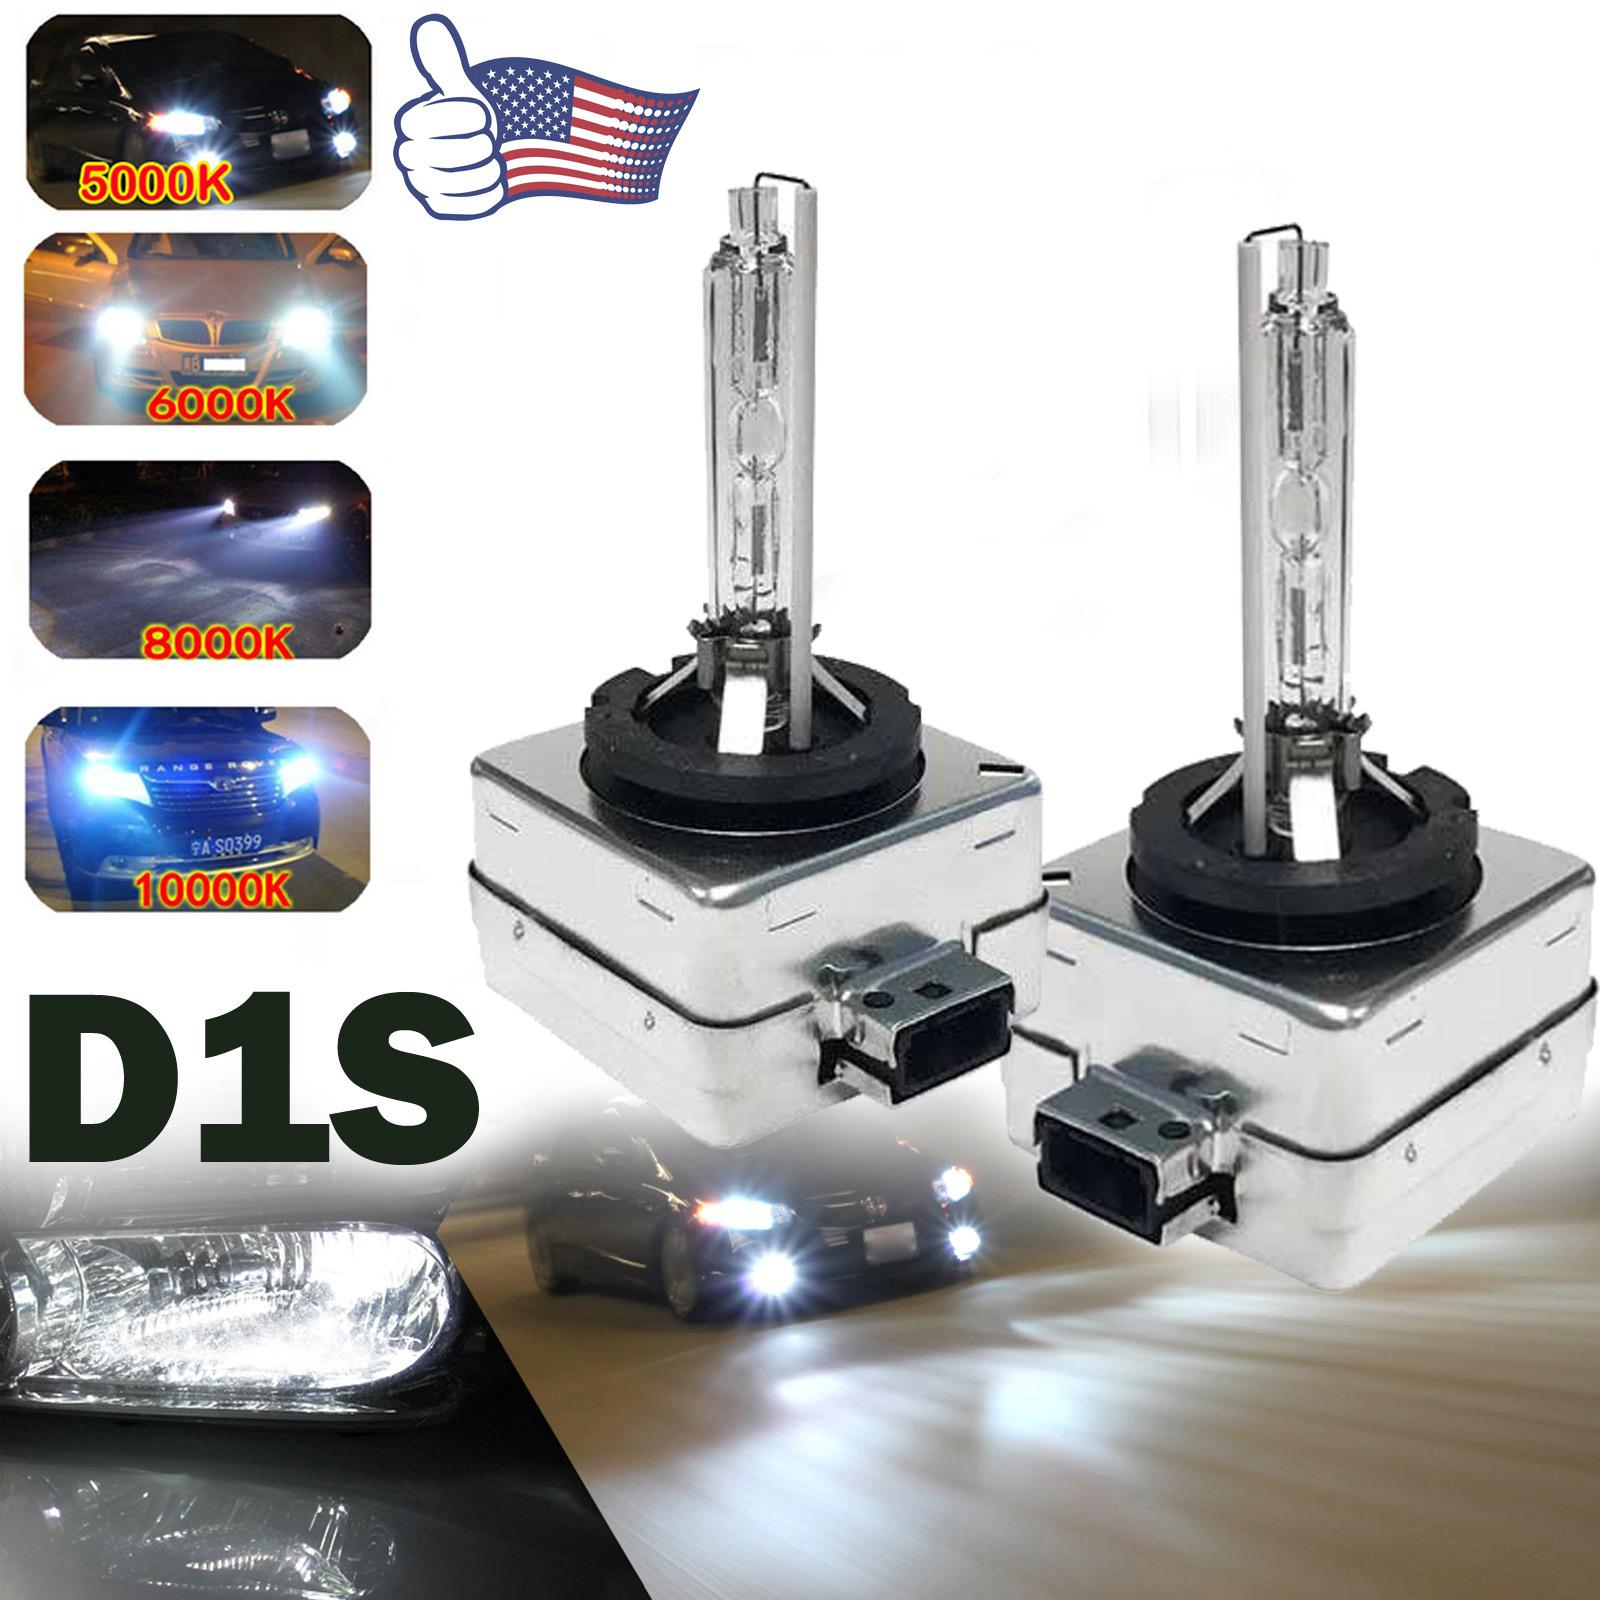 2PCS D1S OEM Xenon HID Bulbs 5000K 6000K 8000K 10000K 85415C1 85415